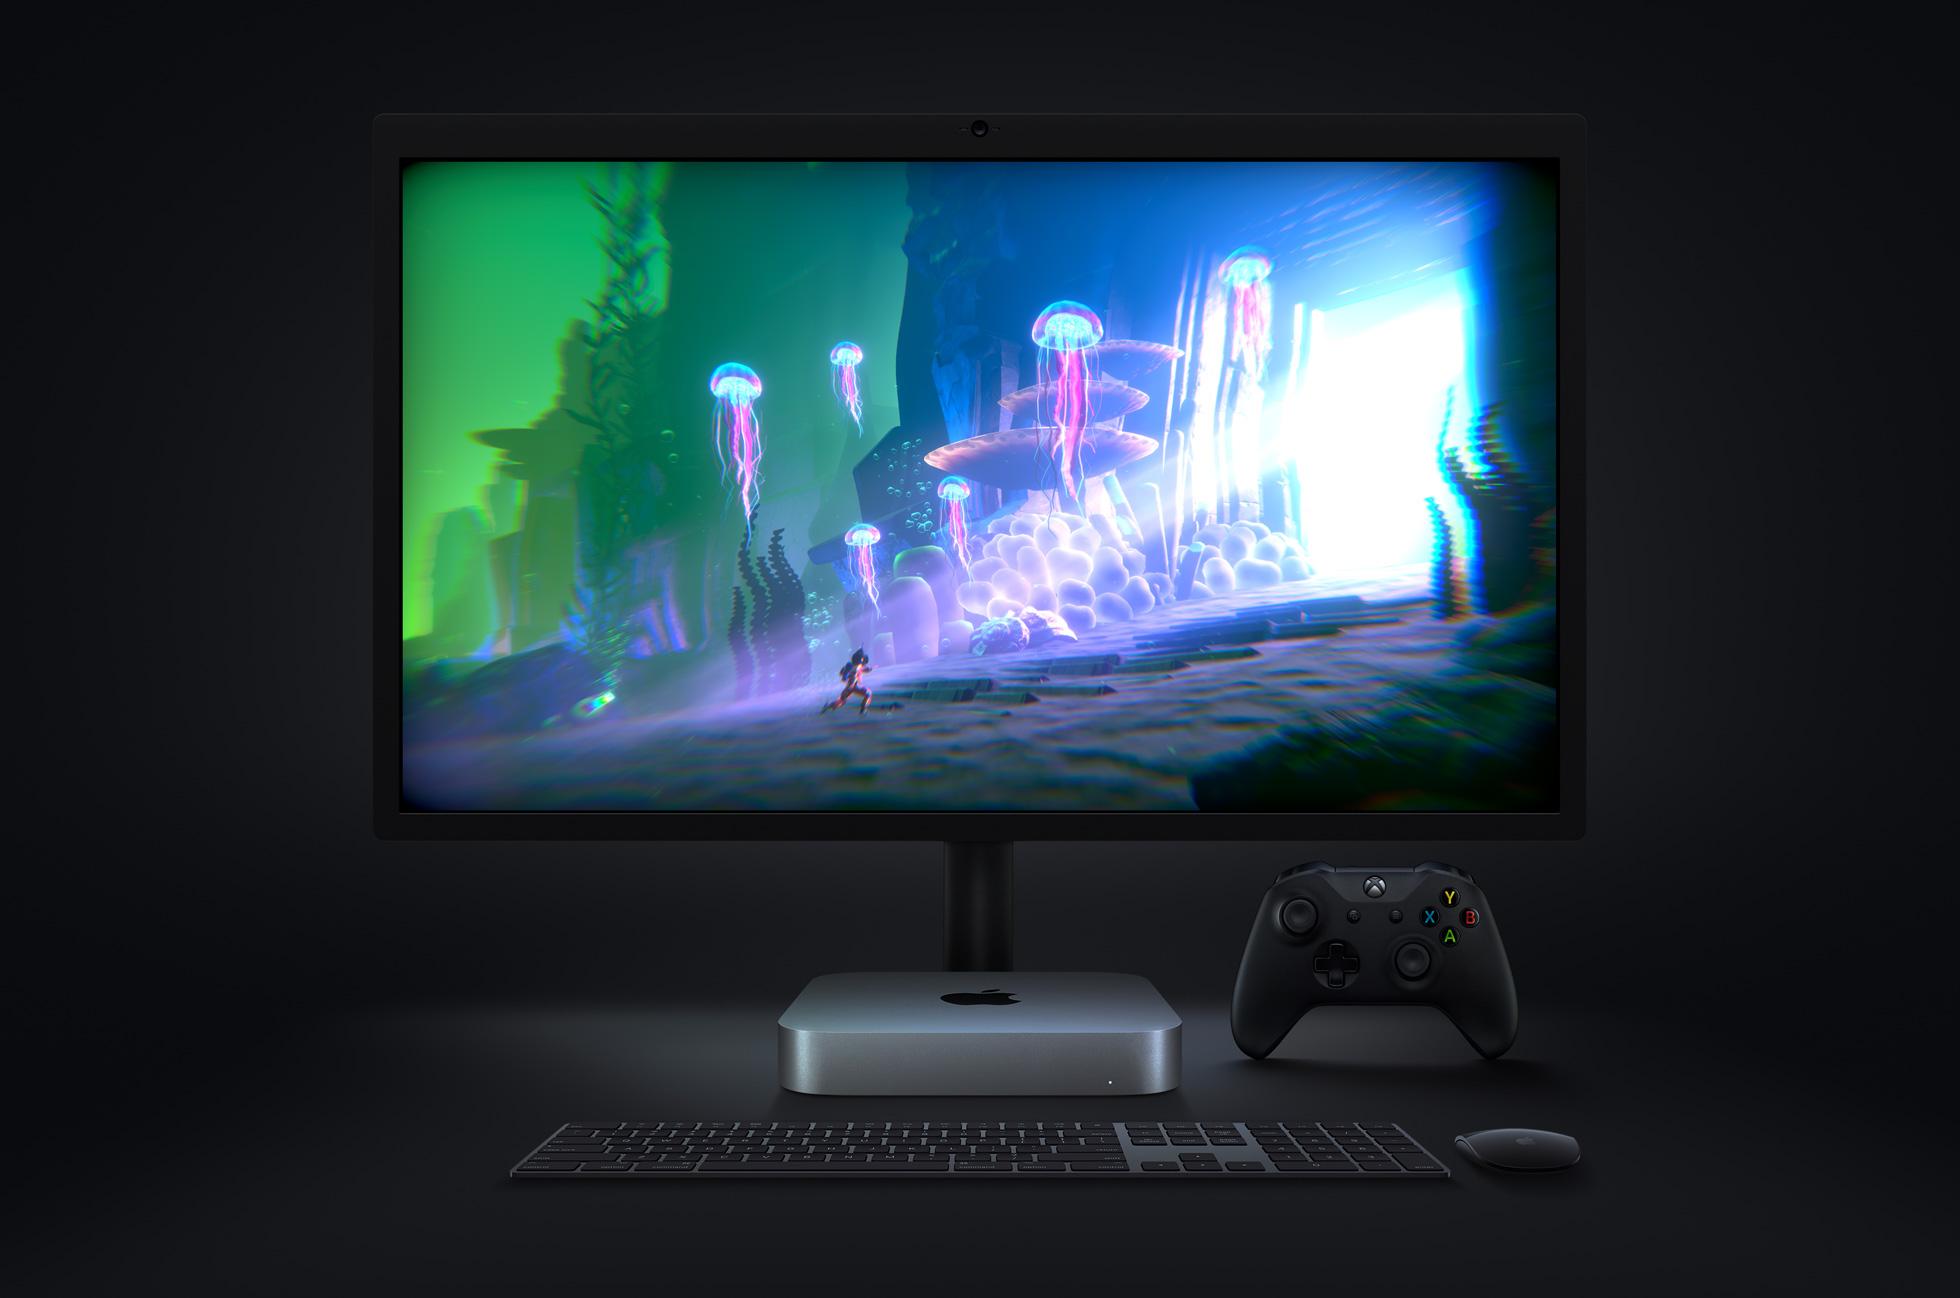 Apple_new-mac-mini-lg-display-gaming-screen_11102020